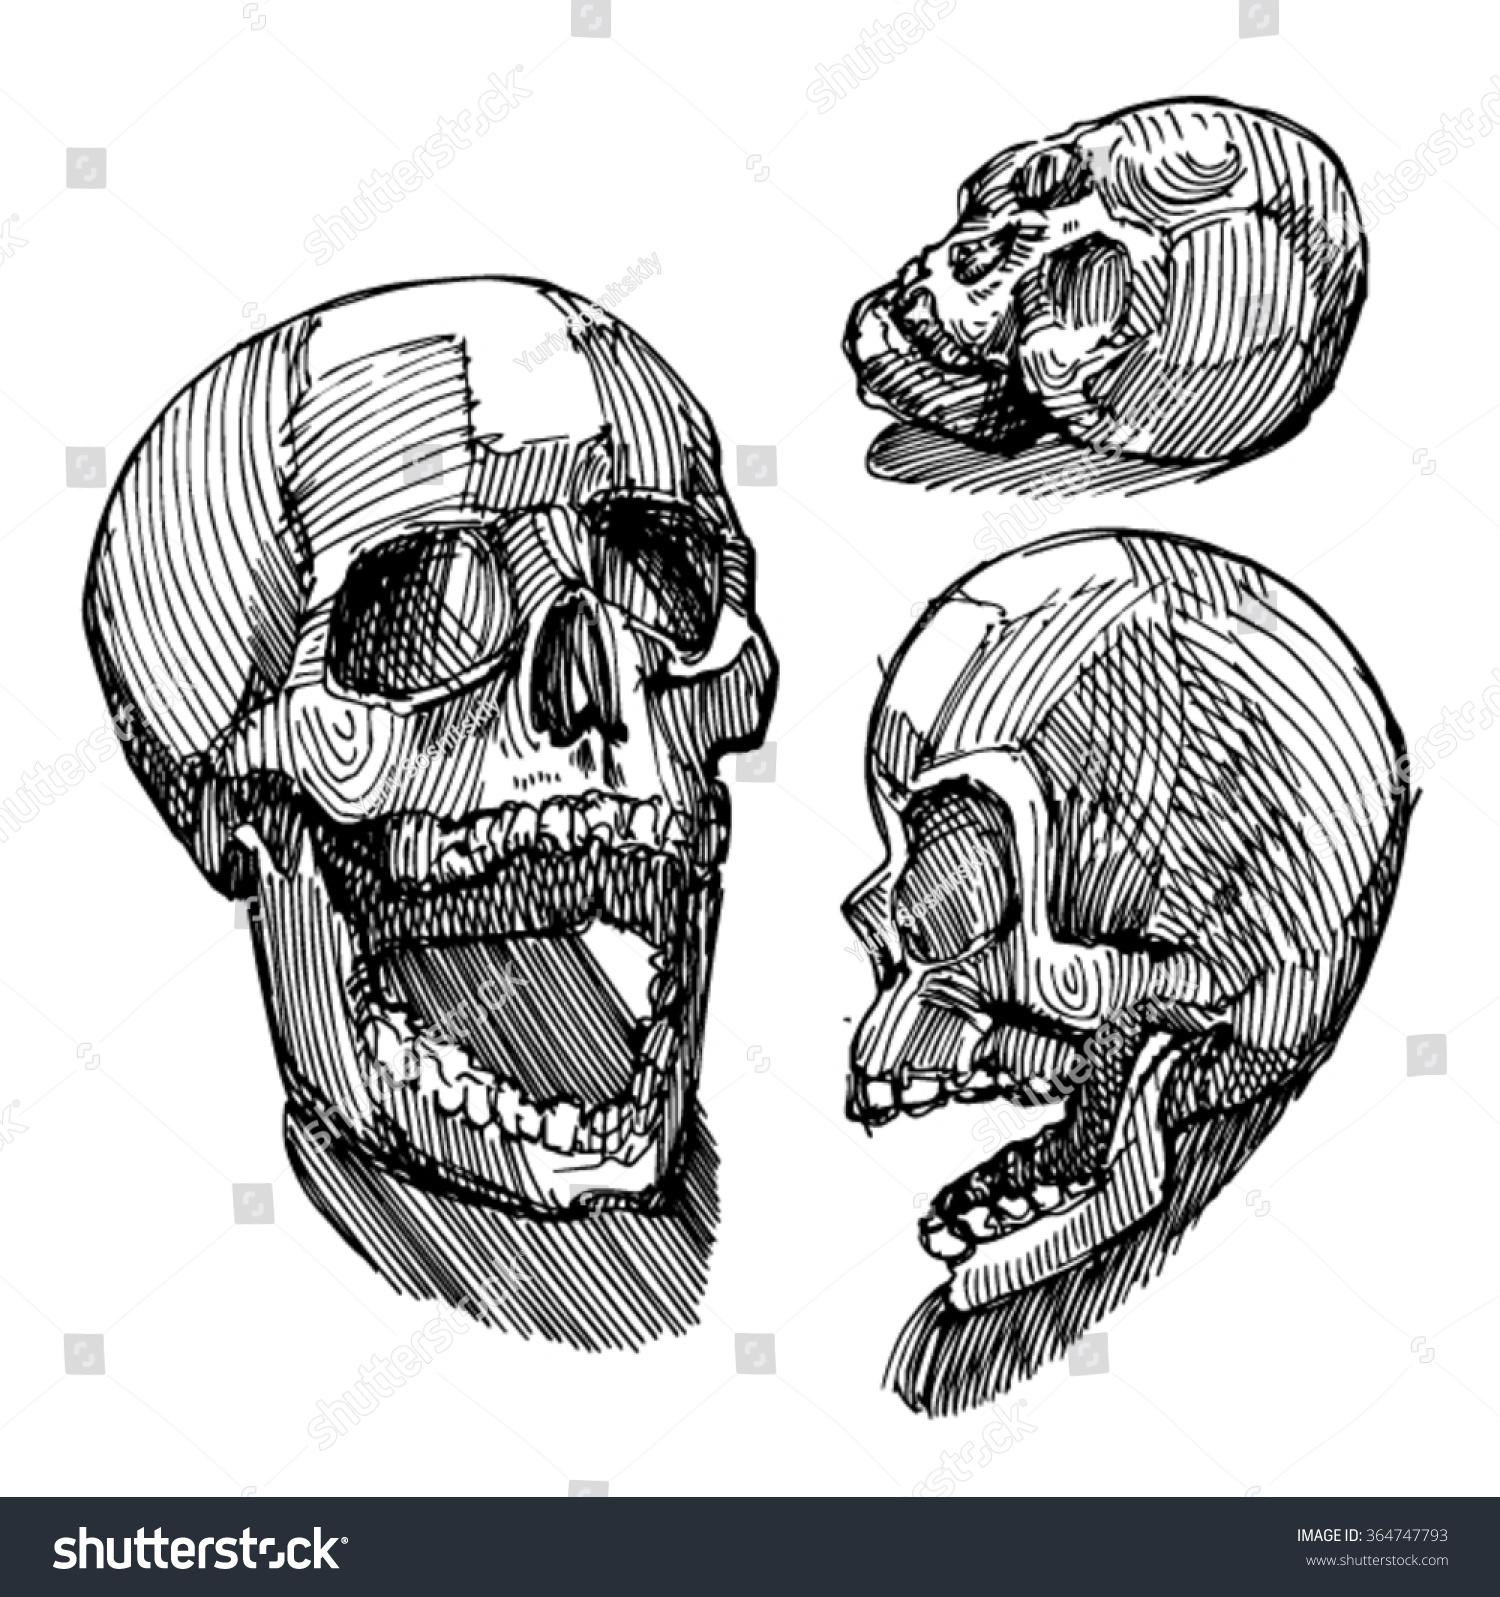 Sketch Skull Sketch Anatomical Skull Academic Stock Vector Royalty